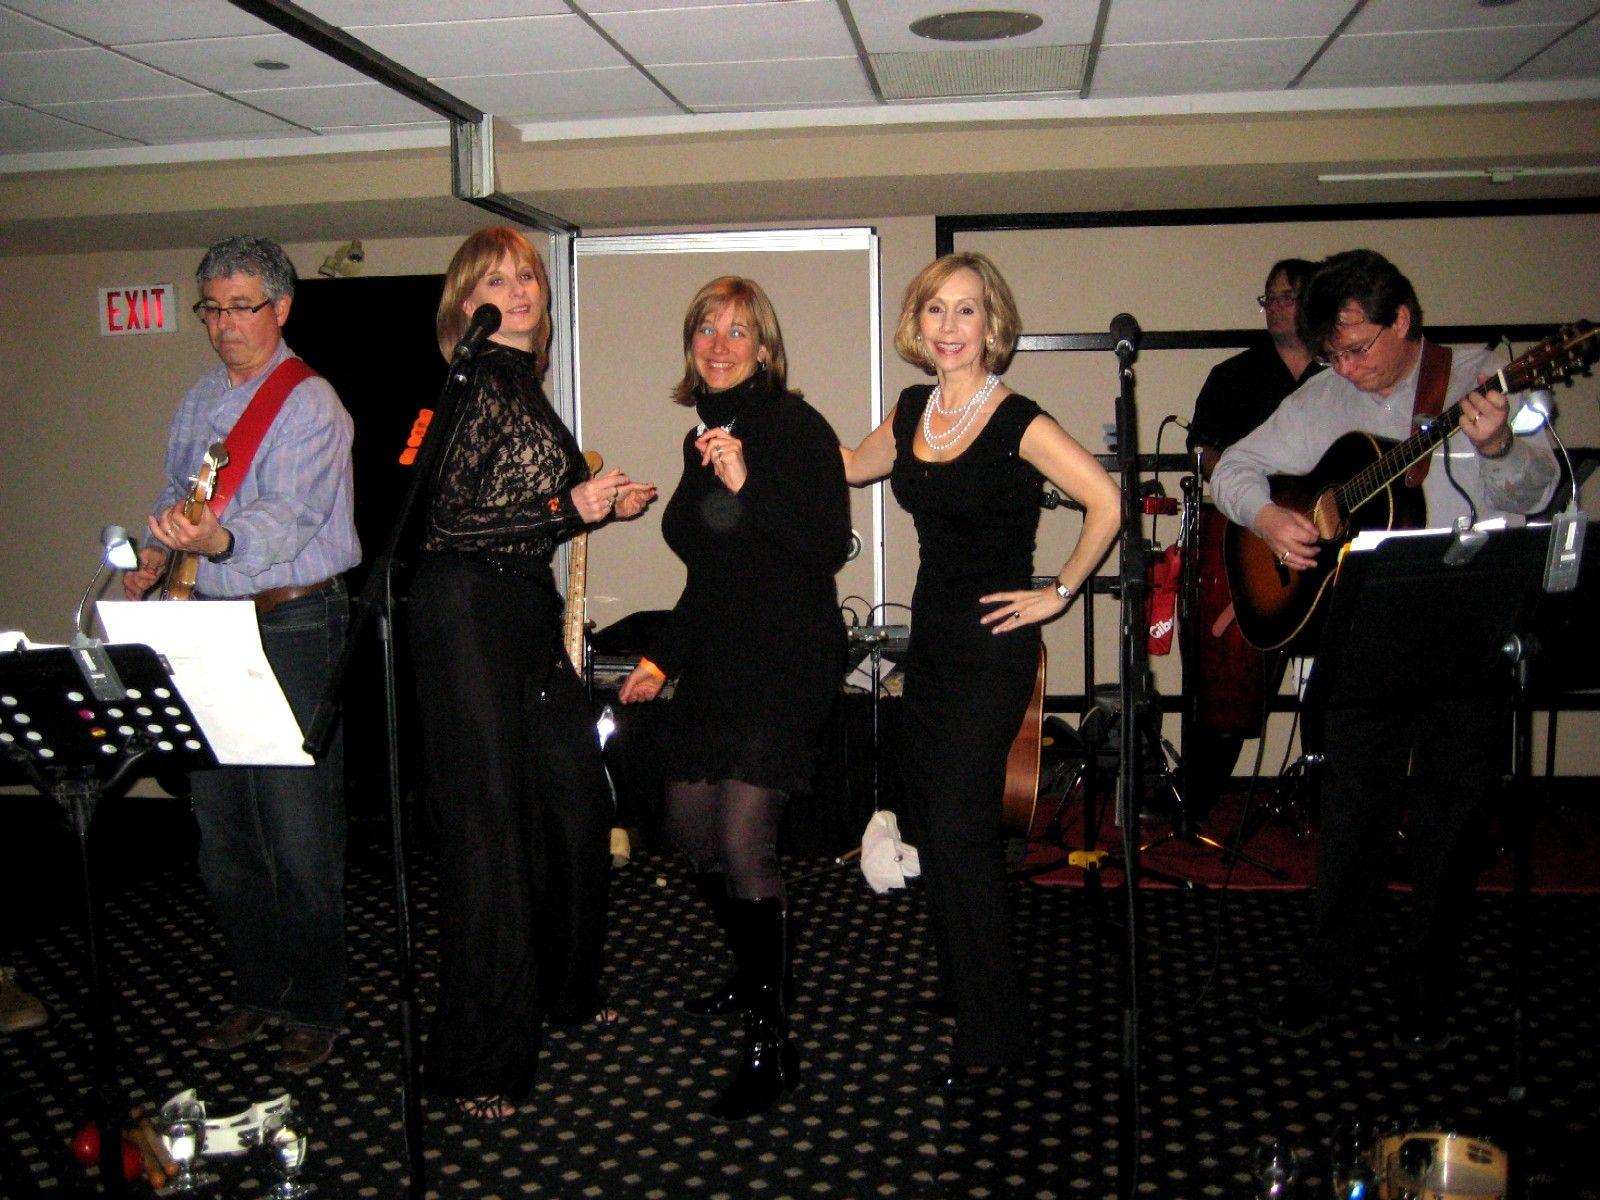 3 women singing/dancing accompanied by band